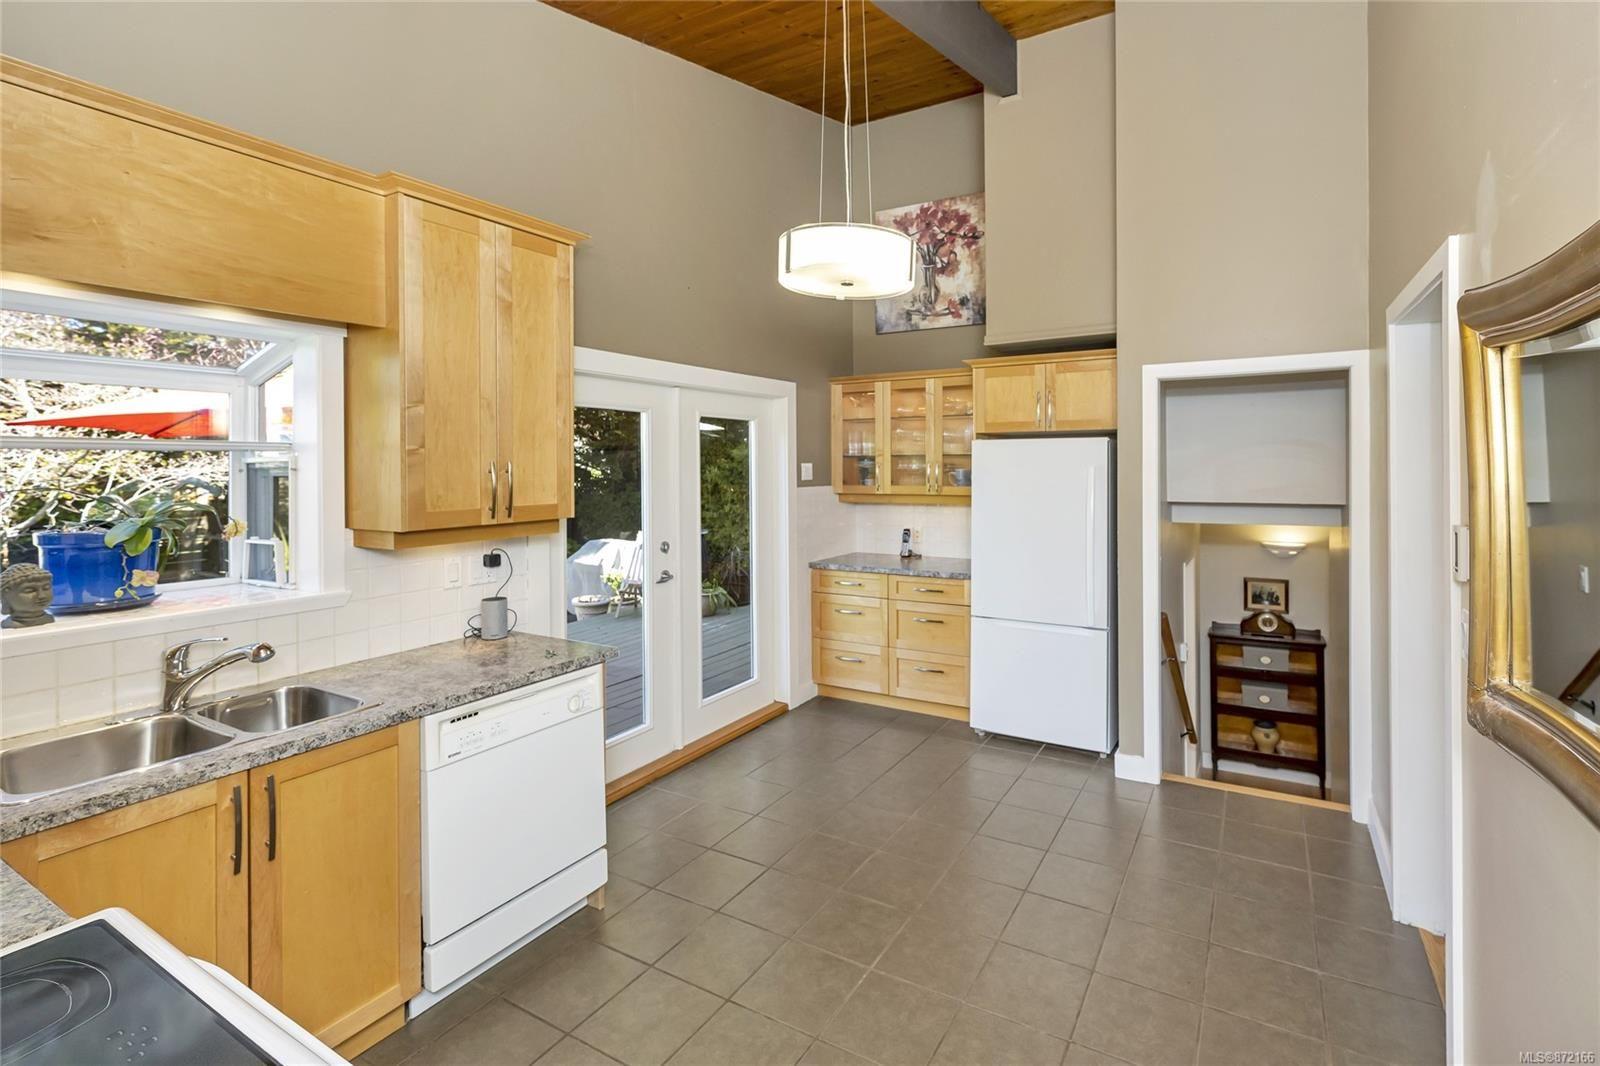 Photo 6: Photos: 1690 Blair Ave in : SE Lambrick Park House for sale (Saanich East)  : MLS®# 872166